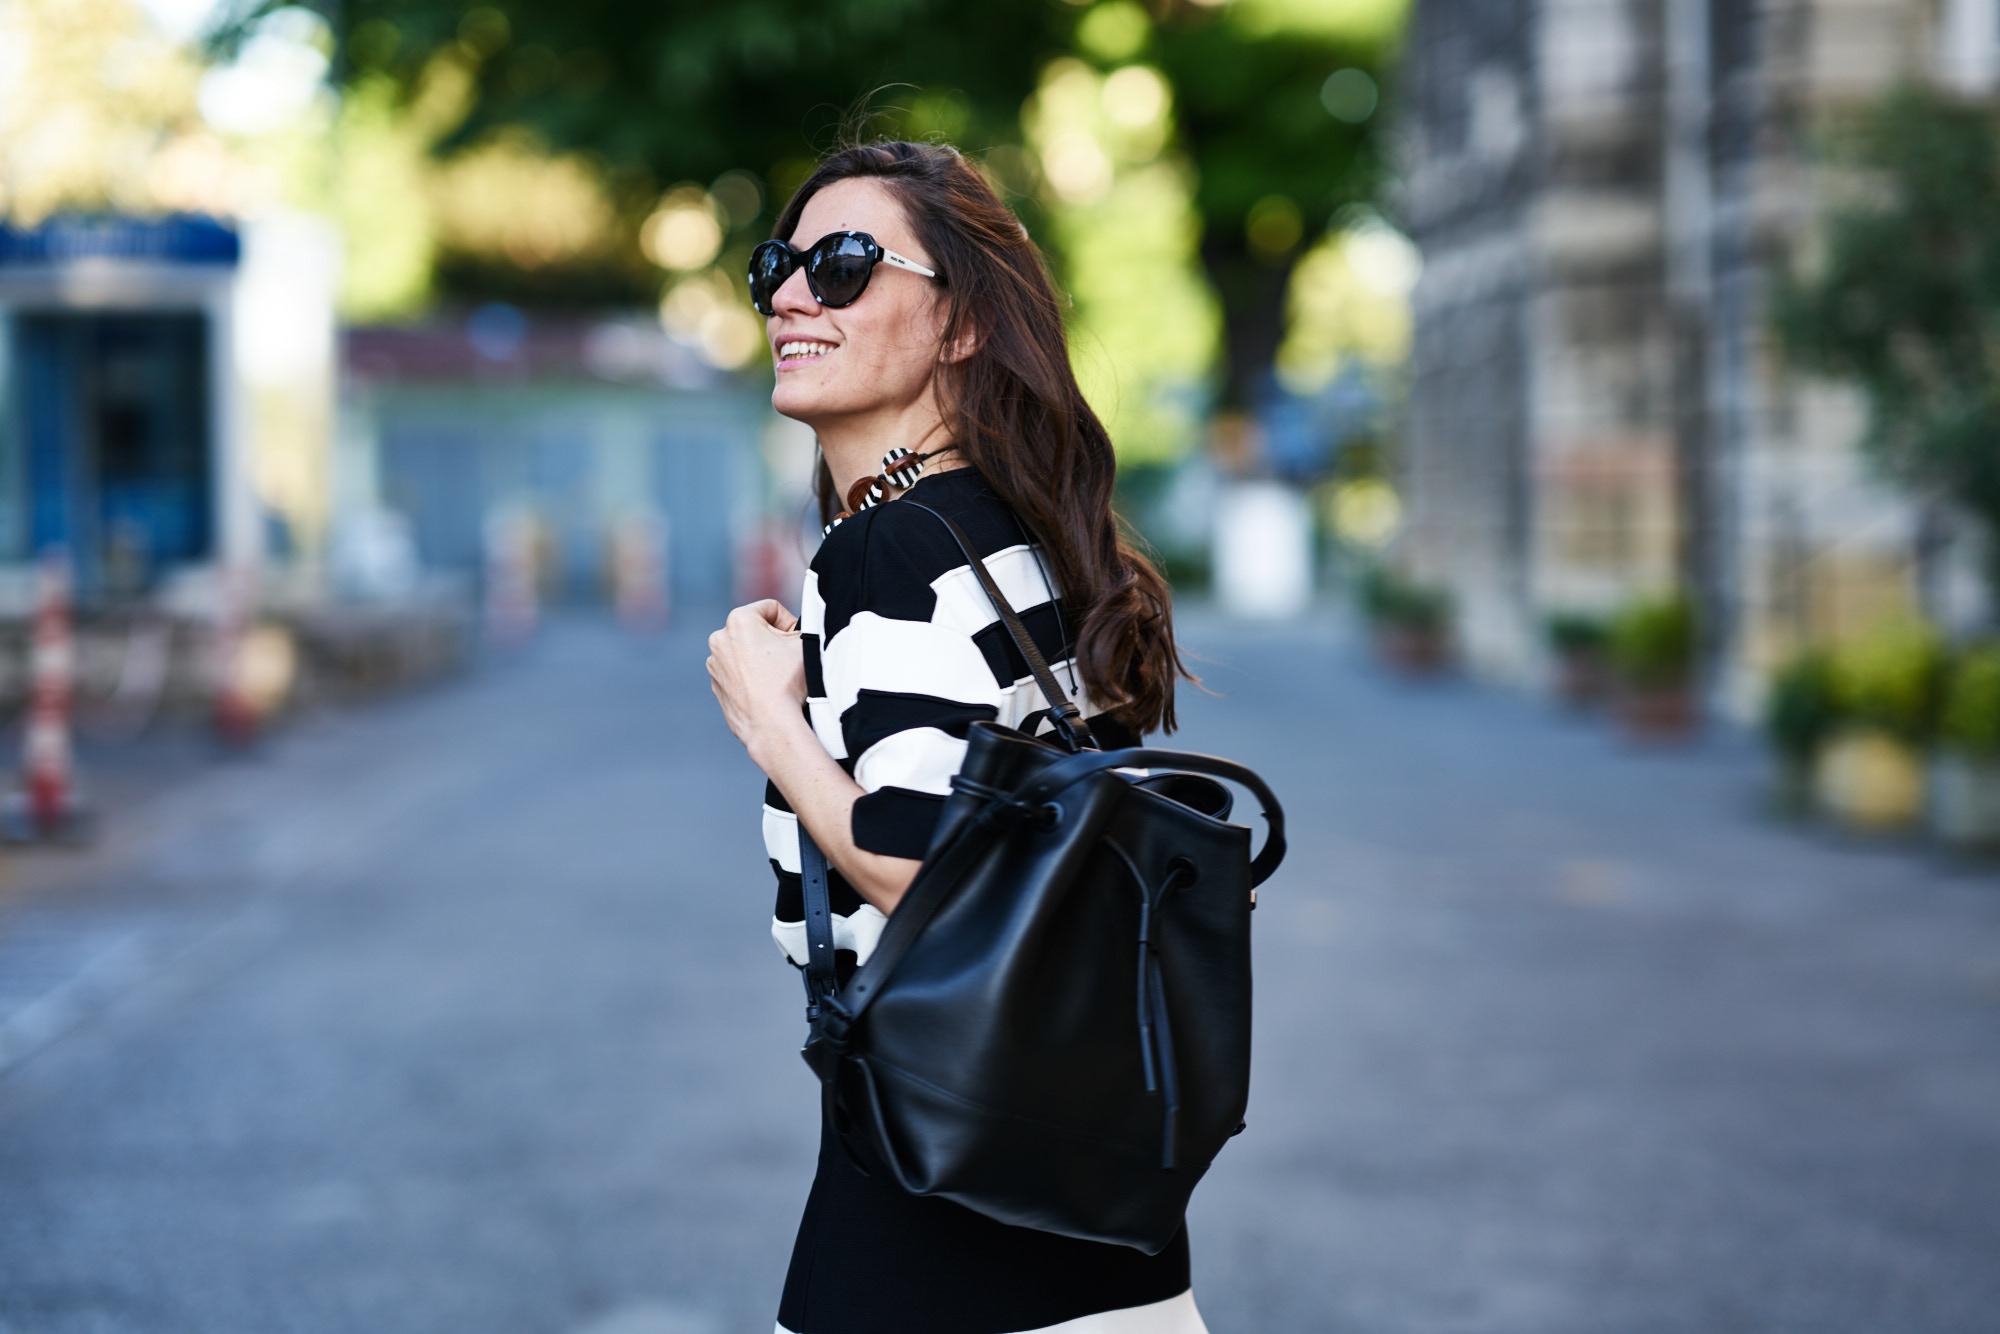 billur saatci, offnegiysem, street style, turkish style blogger, bw, stripes, black and white, opening ceremony, phillip lim, miu miu, house of camellia, black pepper, boyner, boyner fresh